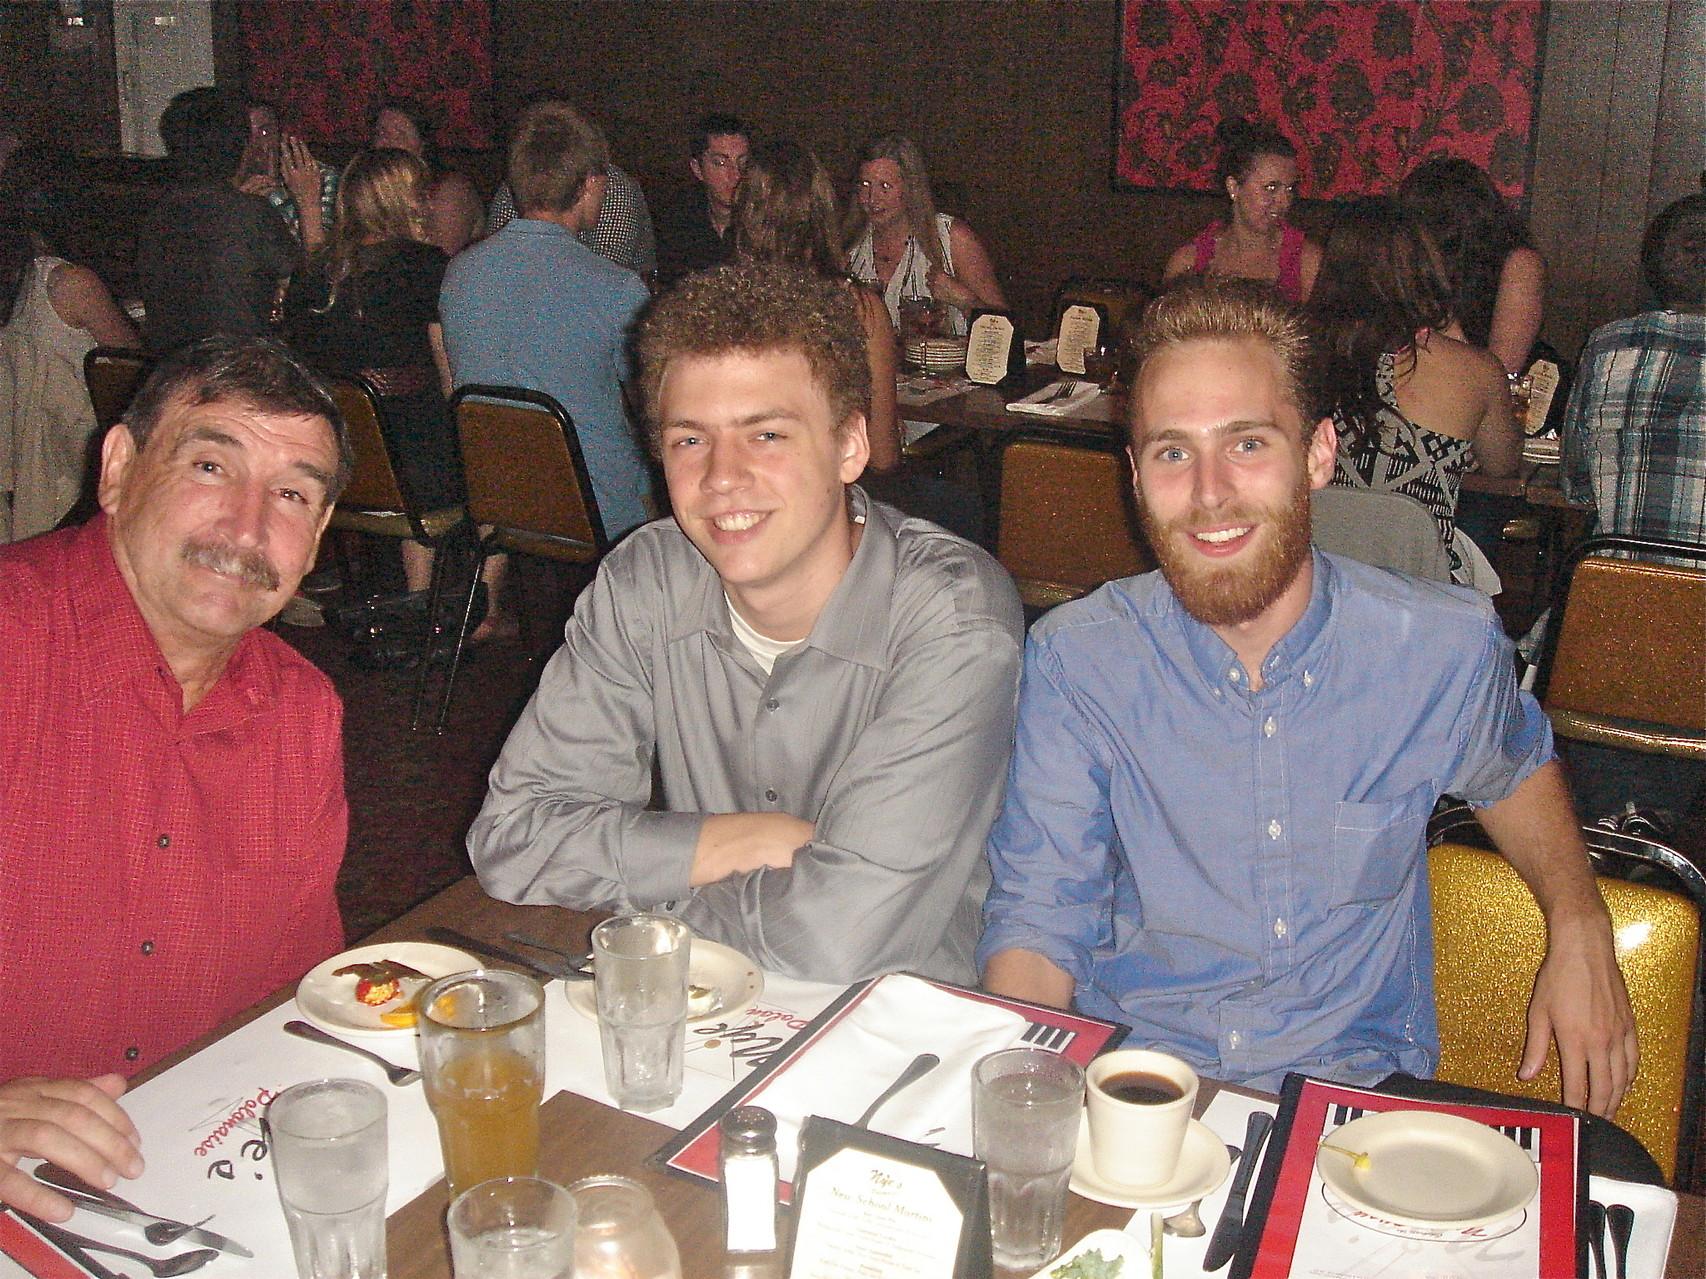 The Attendees: Paul Wagner, Ben Ackerman,& friend Josh